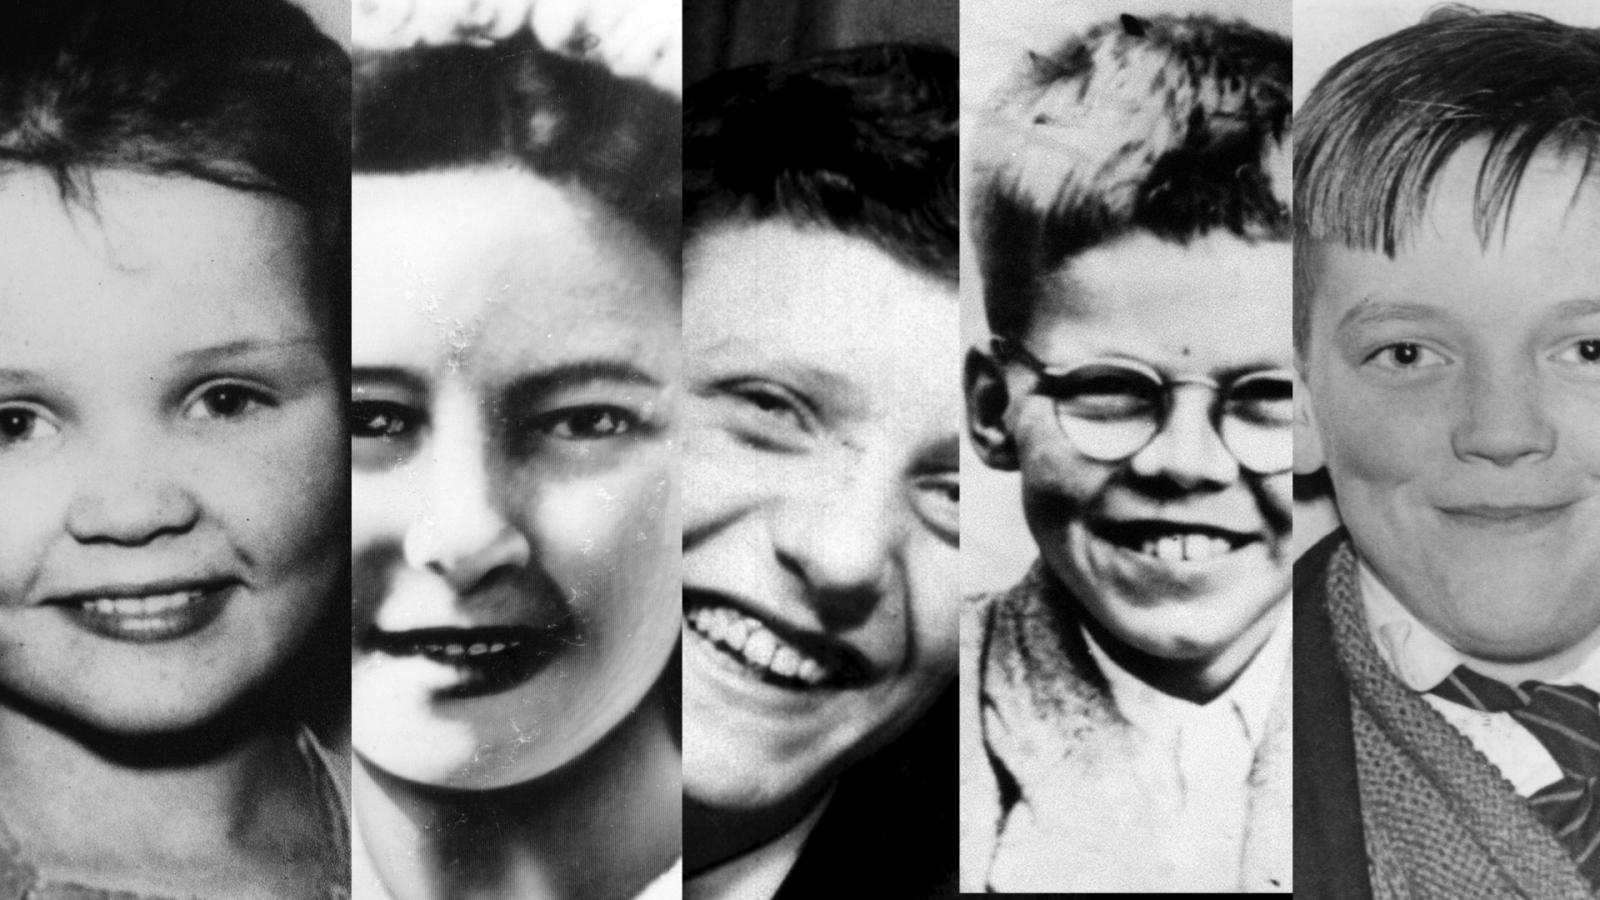 Remembering Ian Brady's victims